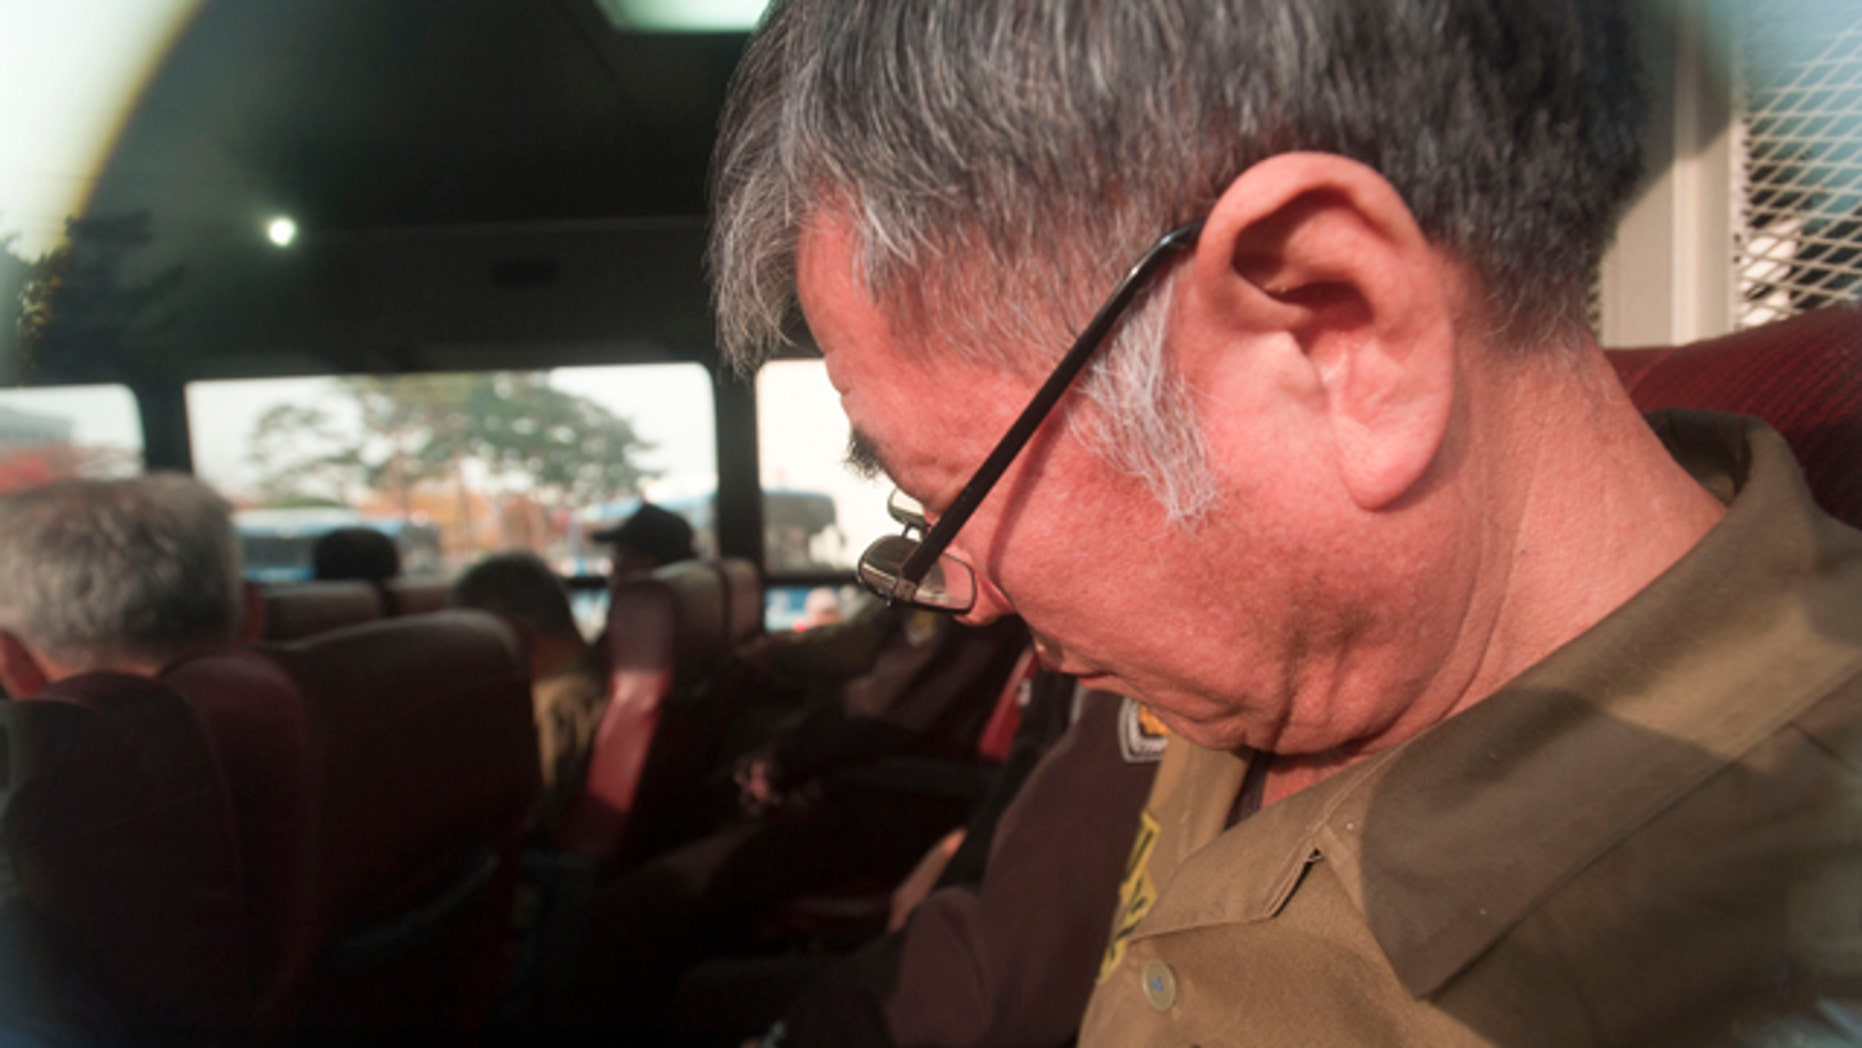 November 11, 2014: Lee Joon-seok, the captain of the sunken South Korean ferry Sewol arrives for verdict and sentence session at Gwangju District Court in Gwangju, South Korea. (AP Photo/Yonhap, Hyung Min-woo)